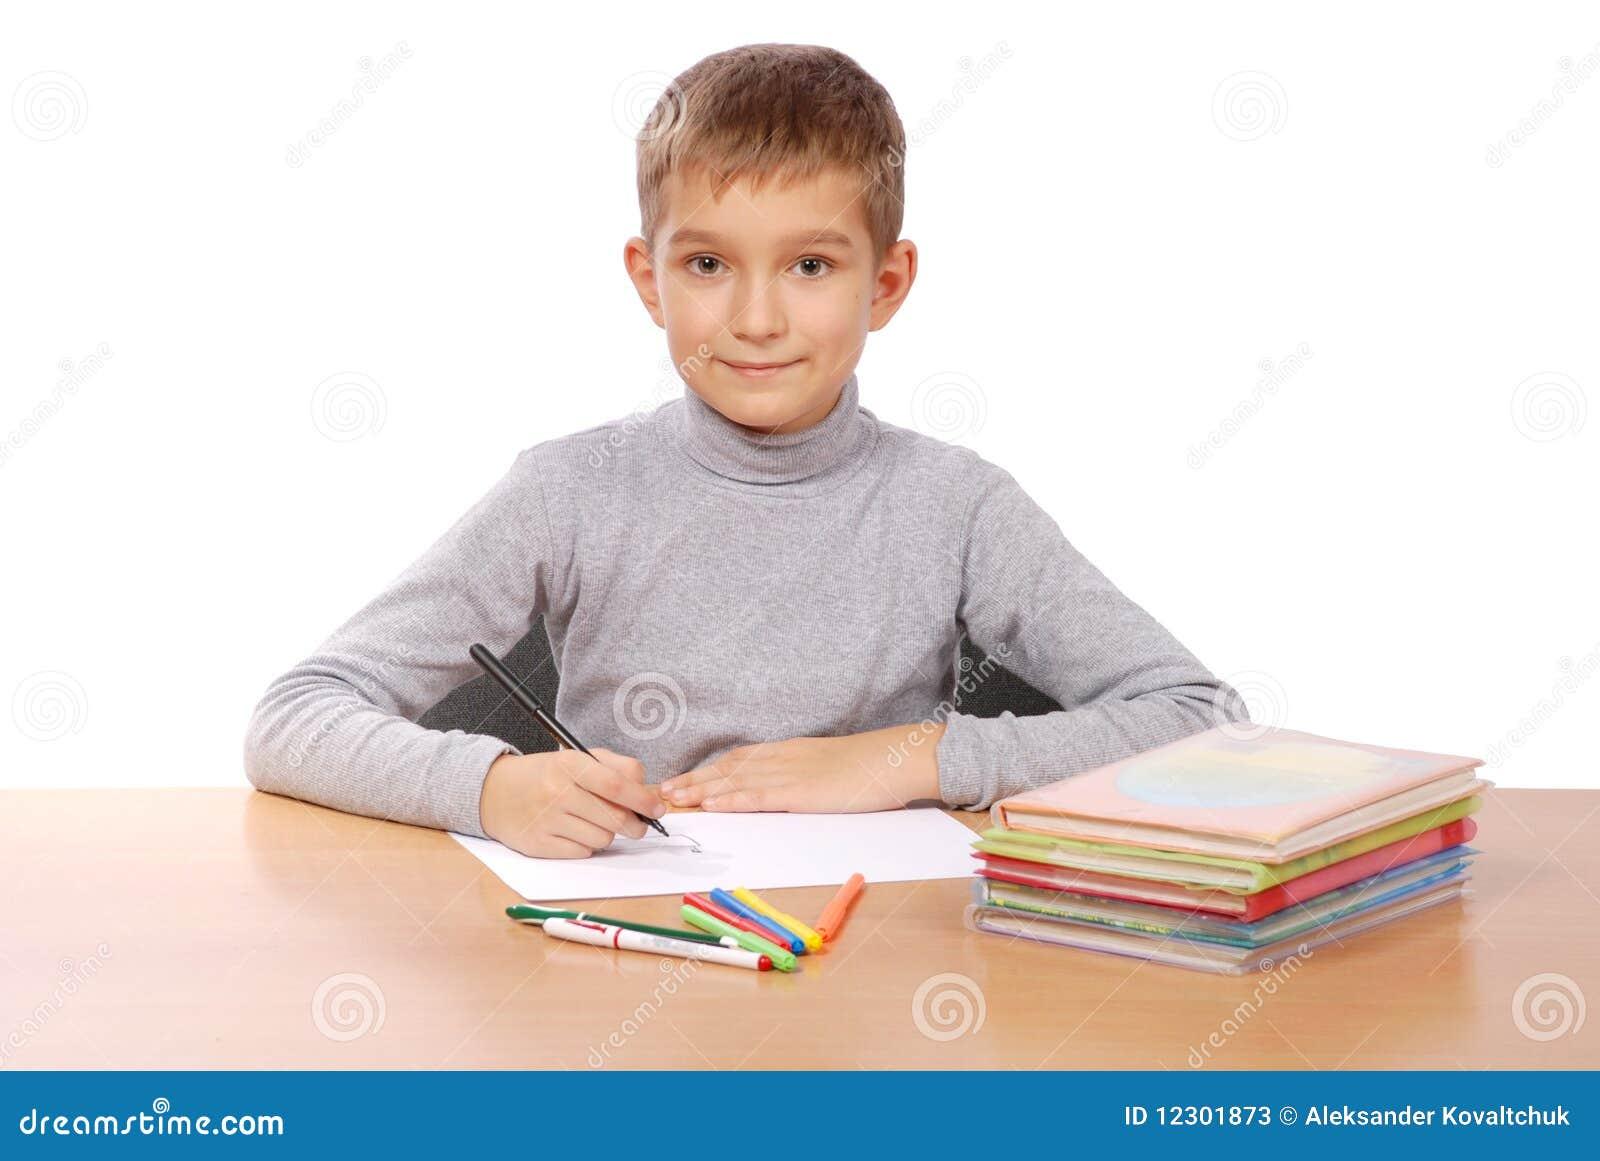 Young Boy Doing School Work Stock Photos - Image: 12301873